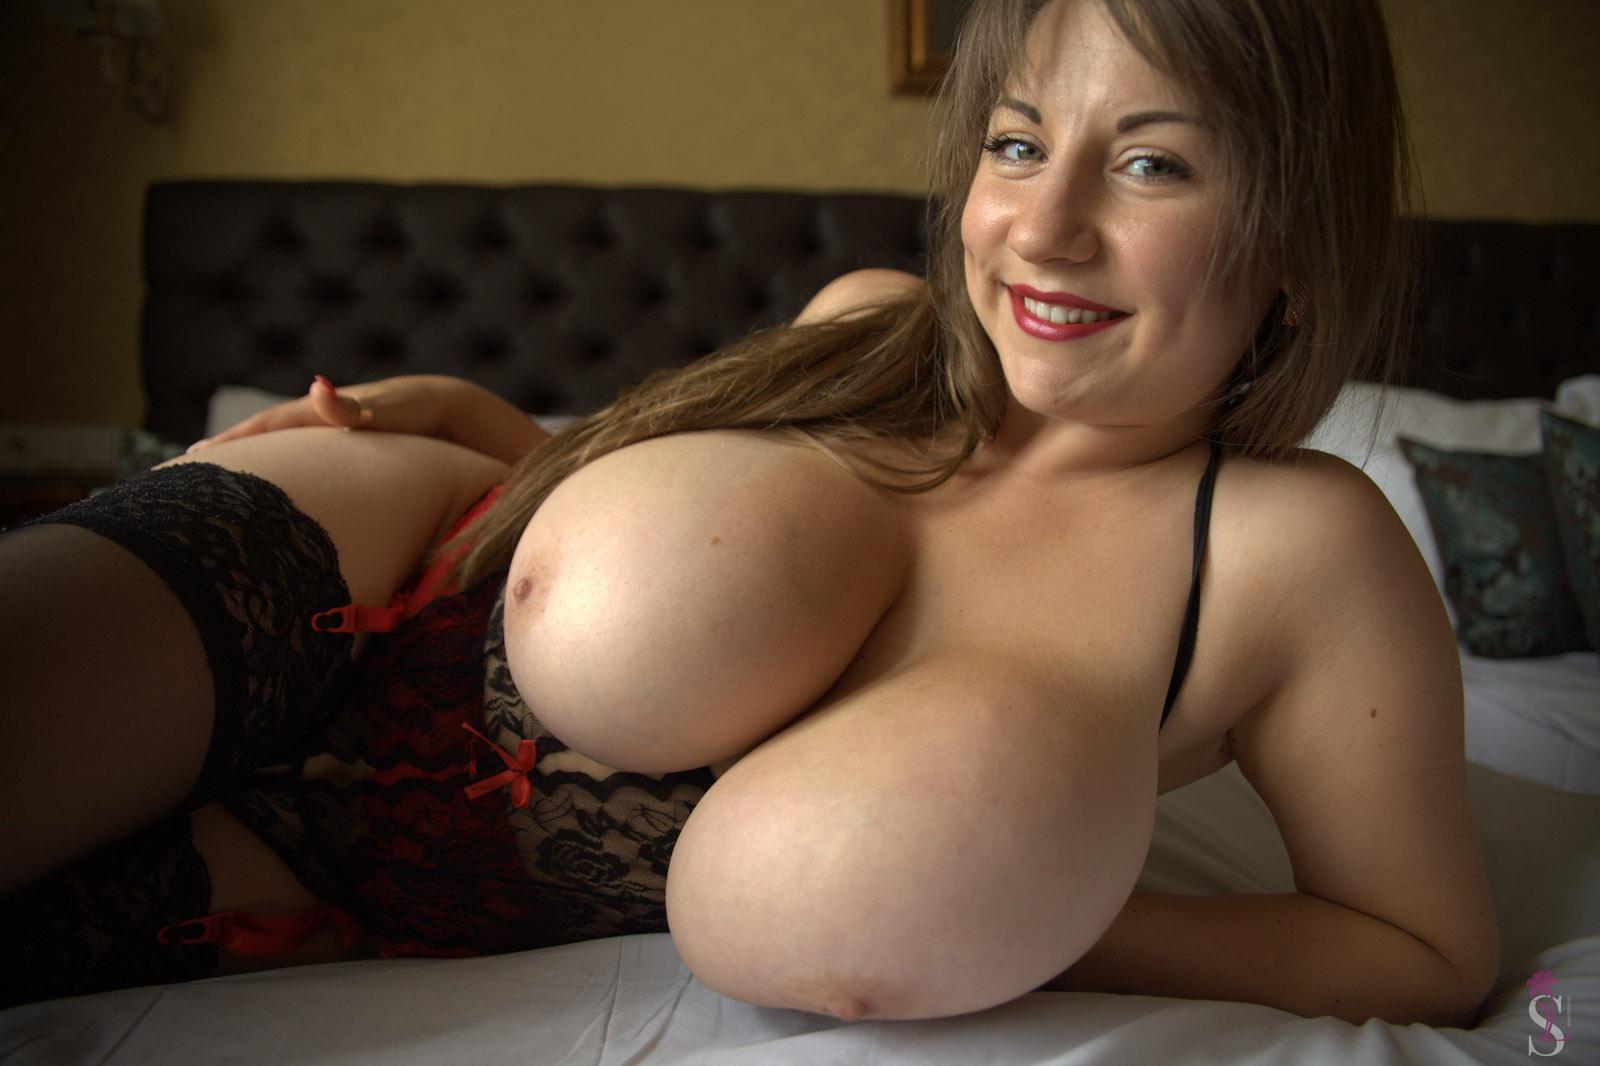 Jav sex photo big tits girls sticking out of swimsuit, javholilc free sample